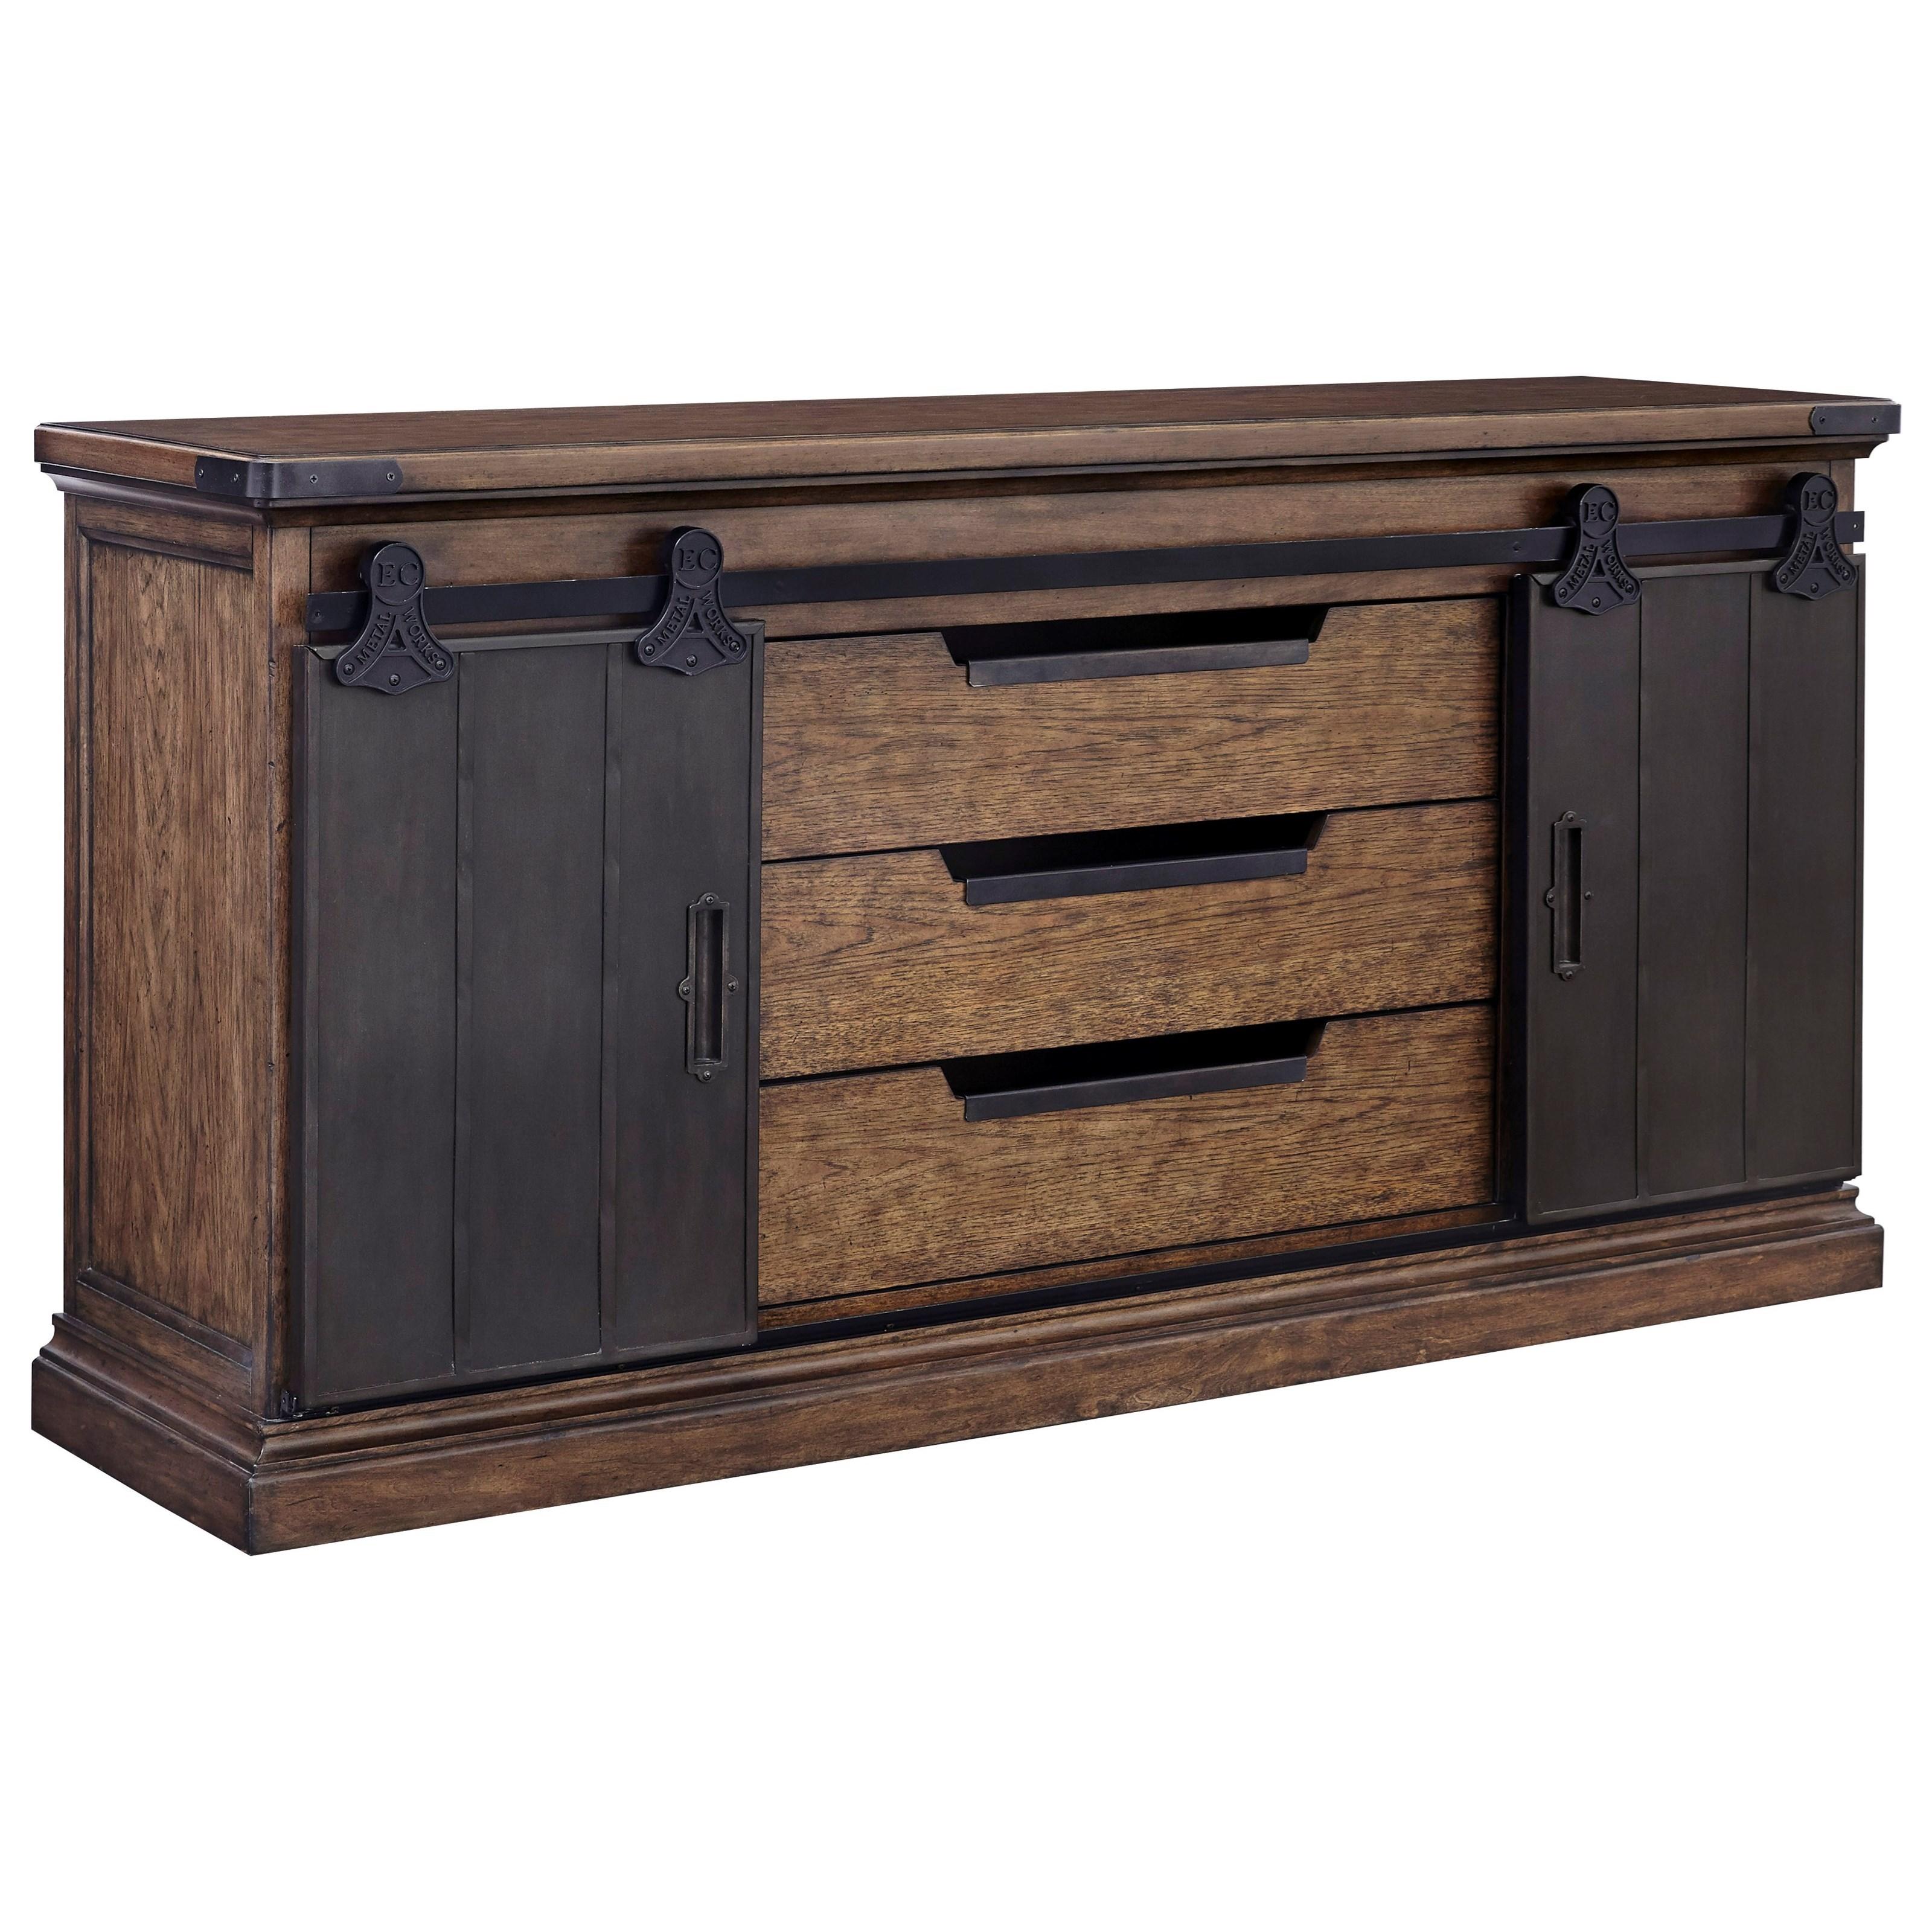 pulaski furniture weston loft buffet with 2 sliding barn door style doors reeds furniture. Black Bedroom Furniture Sets. Home Design Ideas